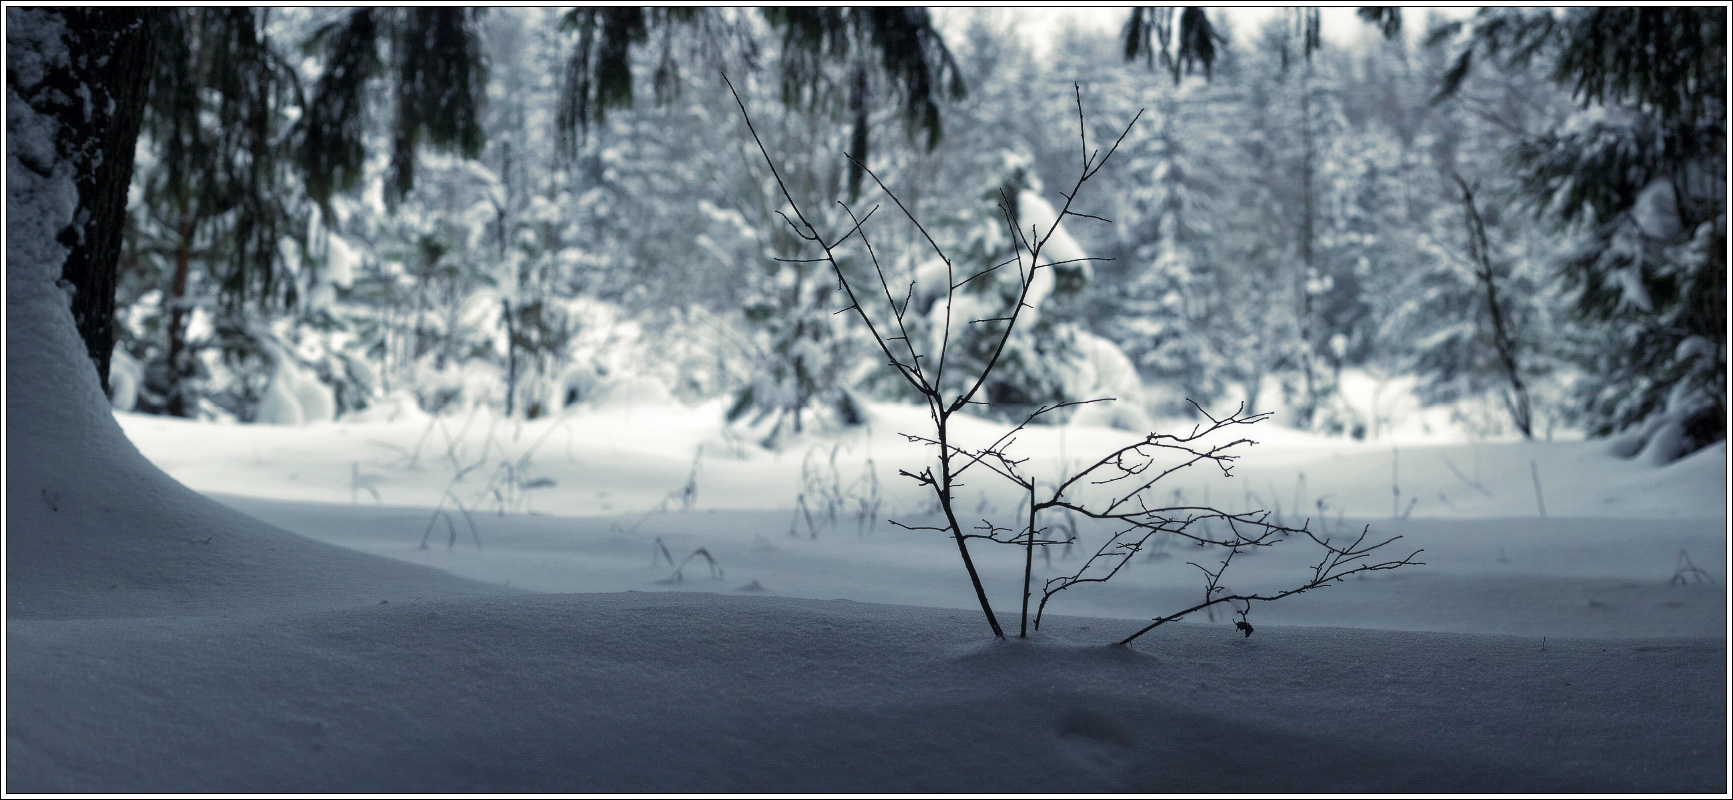 http://i4.imageban.ru/out/2012/01/21/43877aa859624eb3772c0f83f8a4adbc.jpg